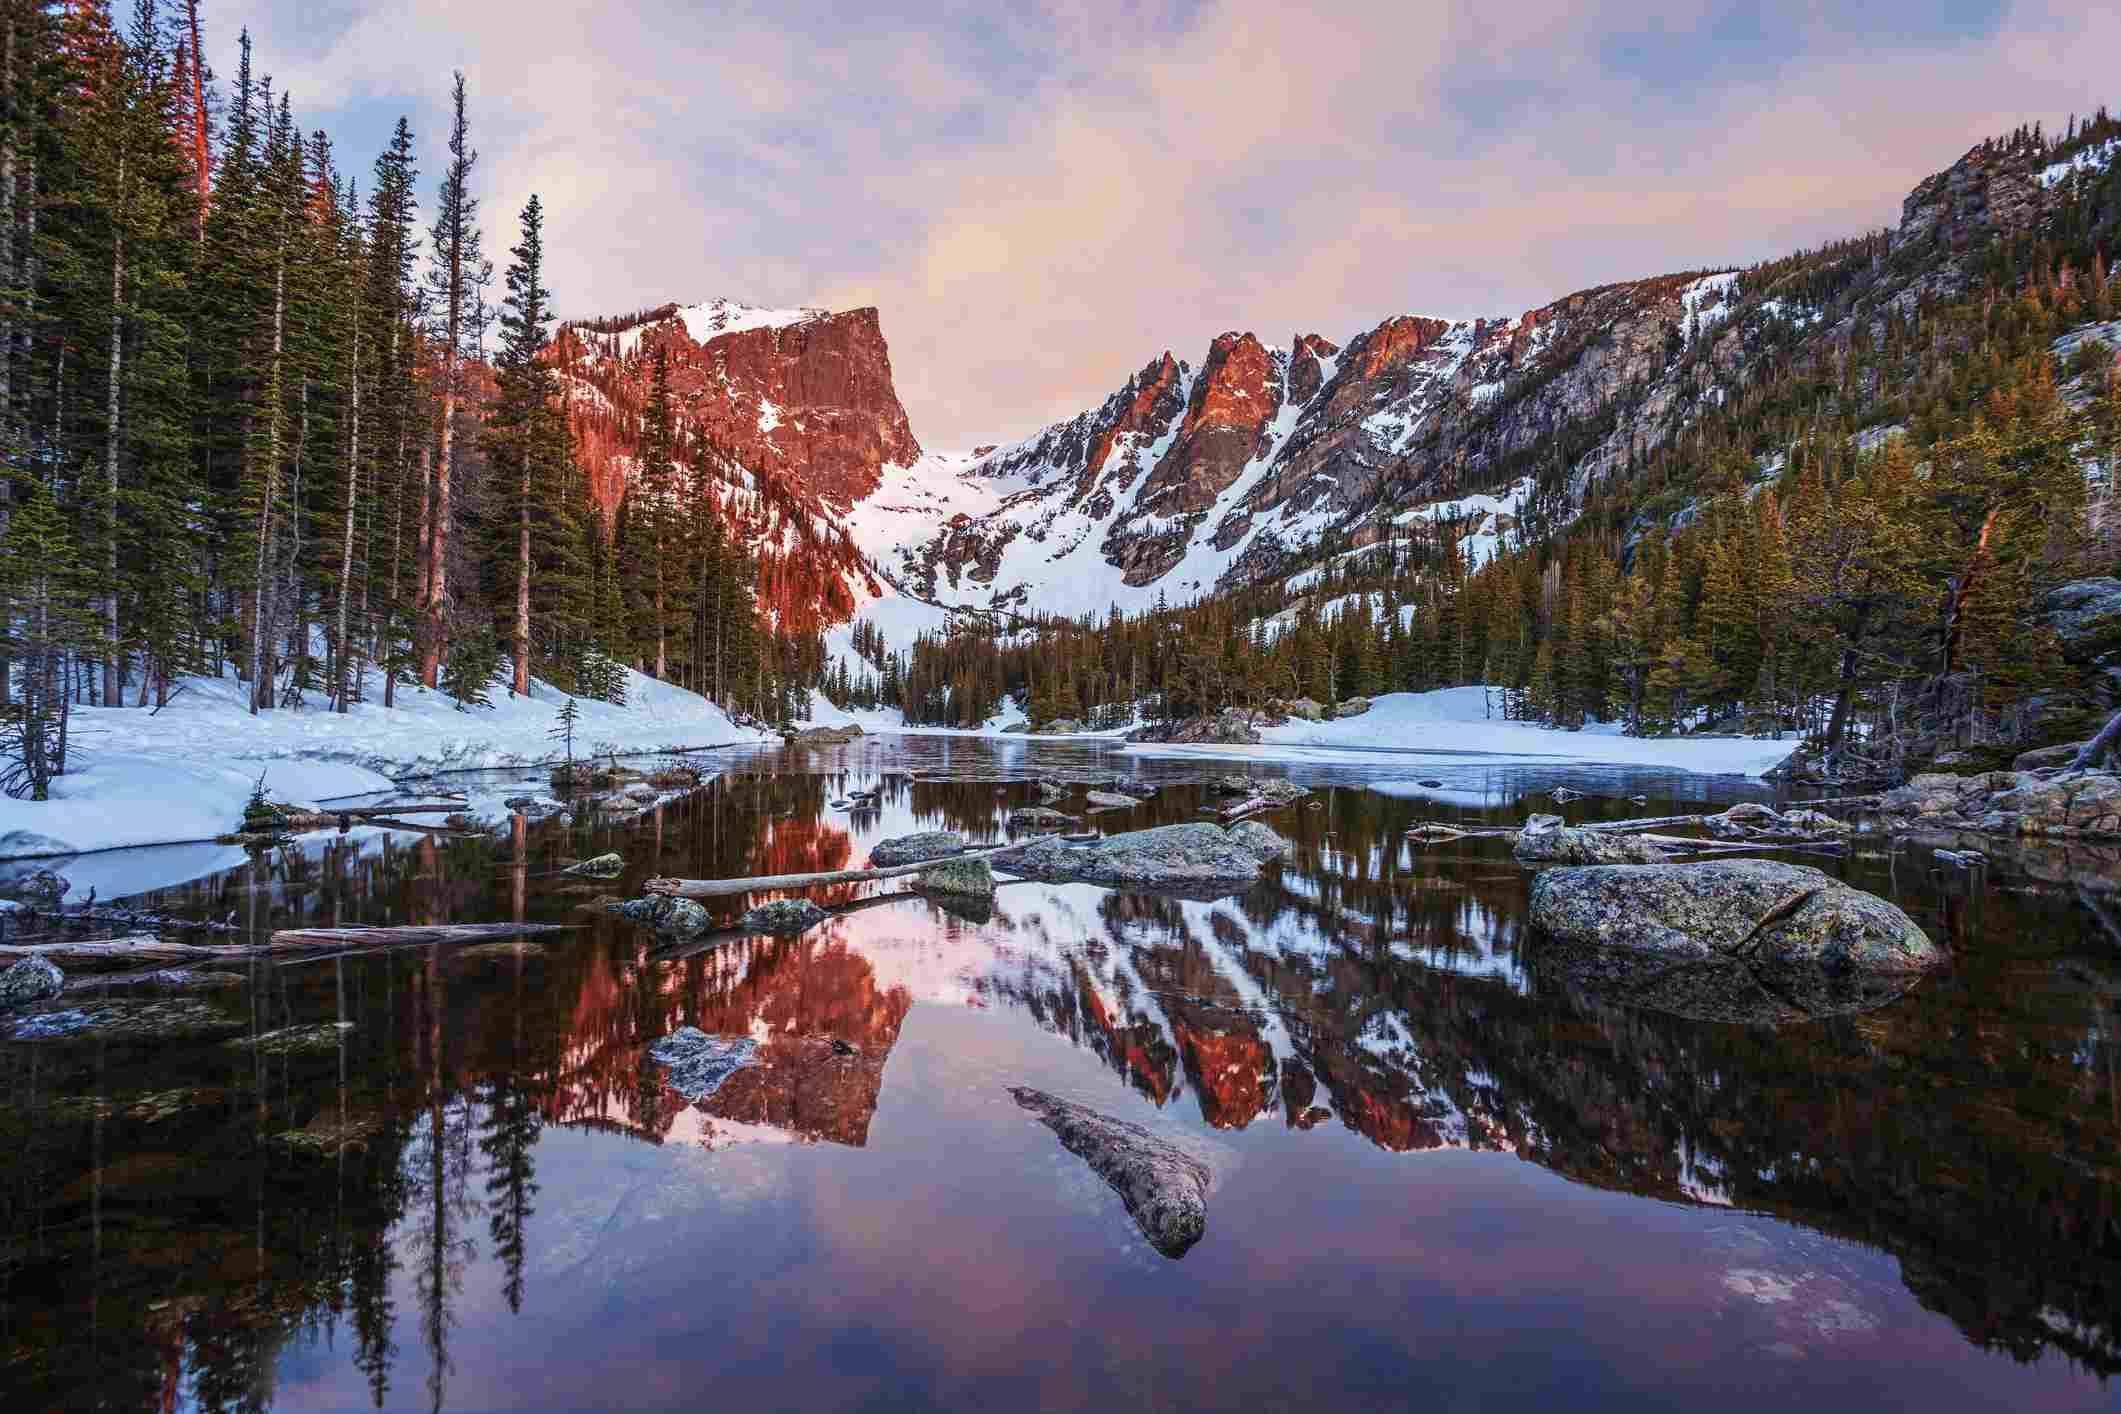 Rocky Mountain National Park's Dream Lake